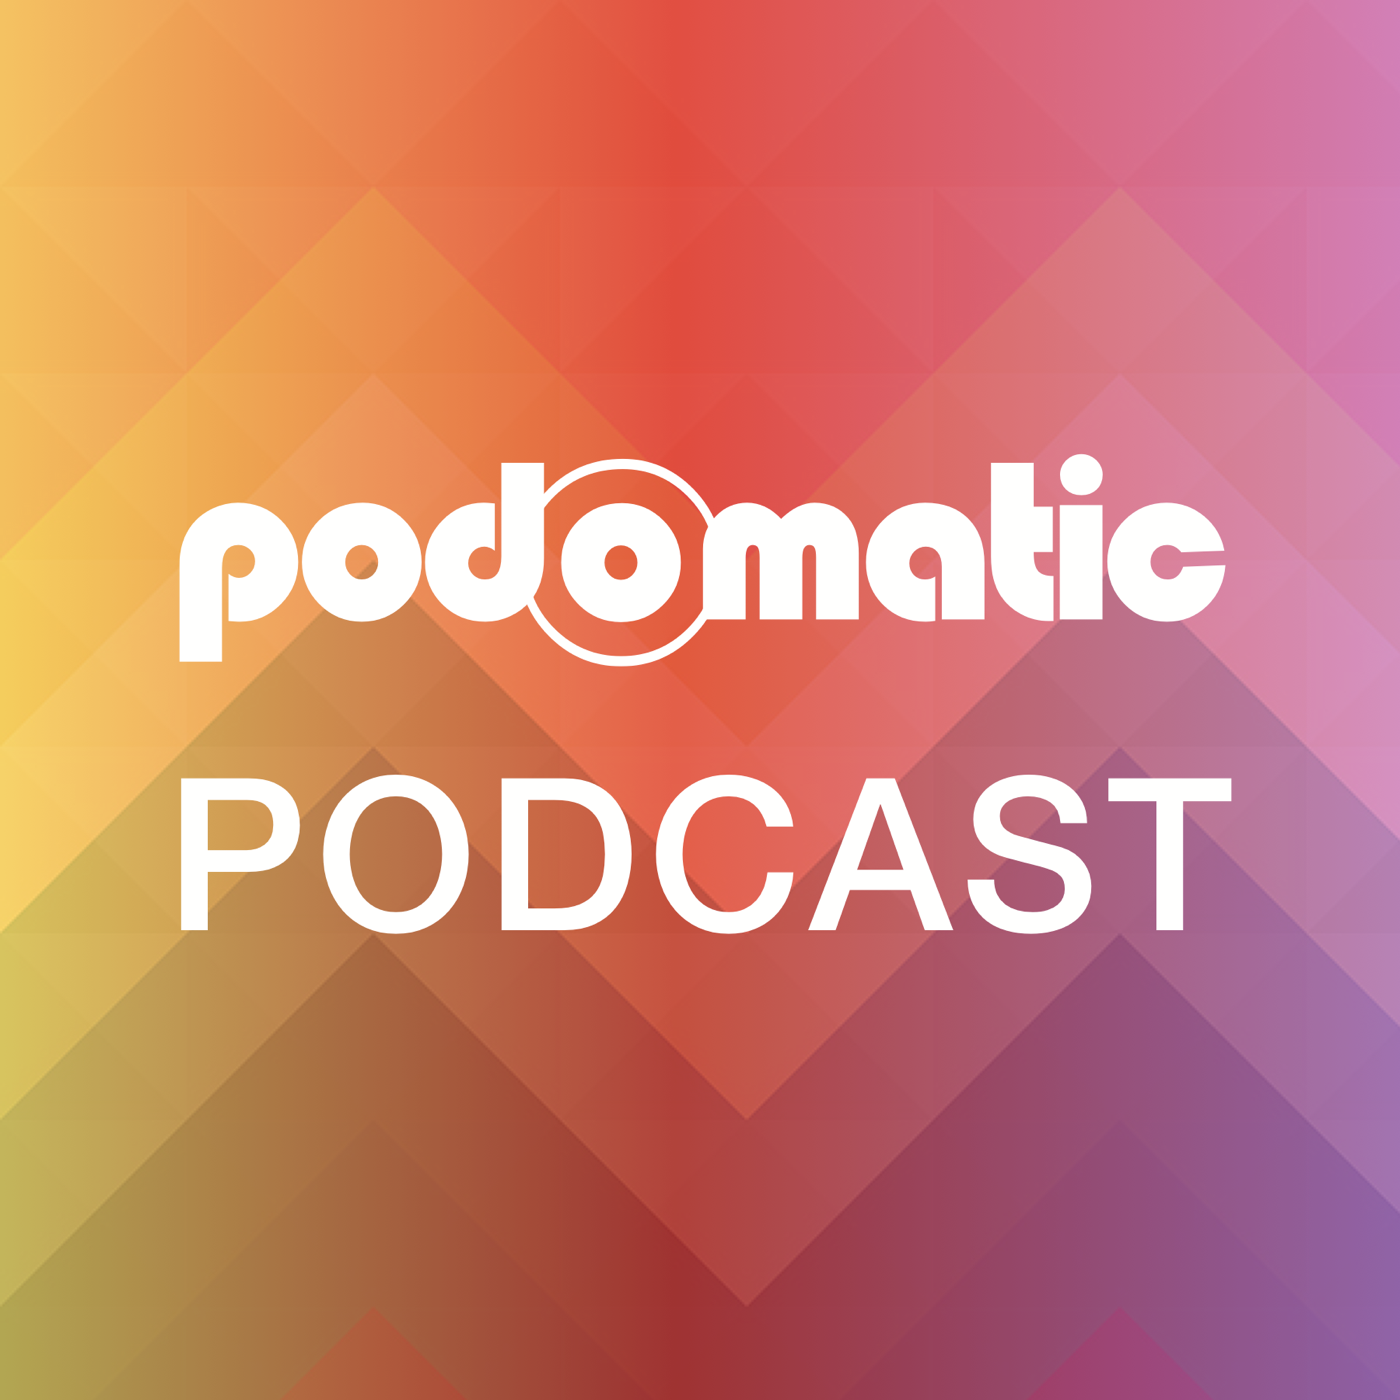 Frederico Montes' Podcast